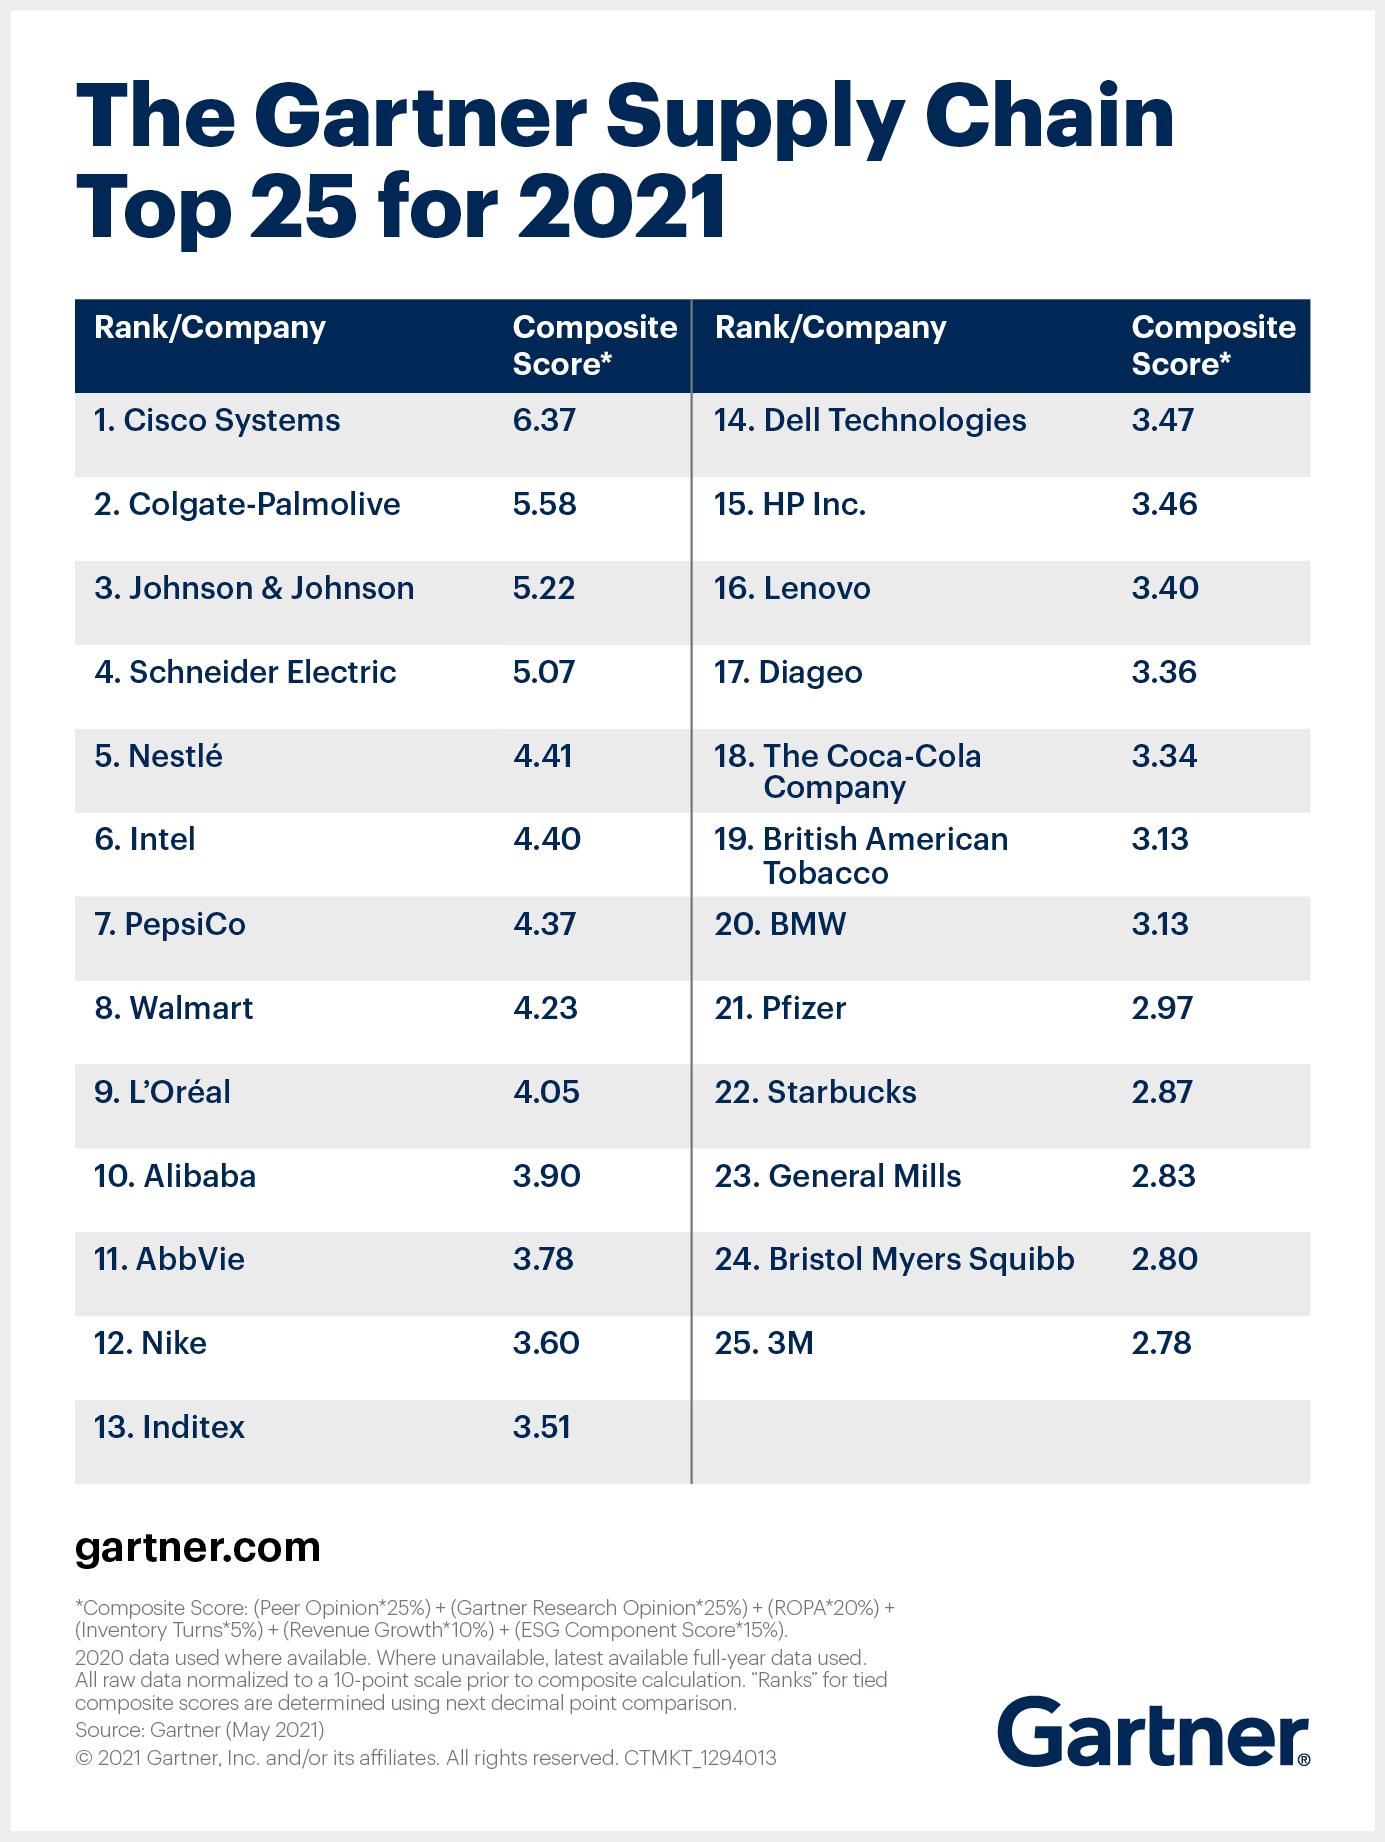 Top Supply Chain Companies 2021